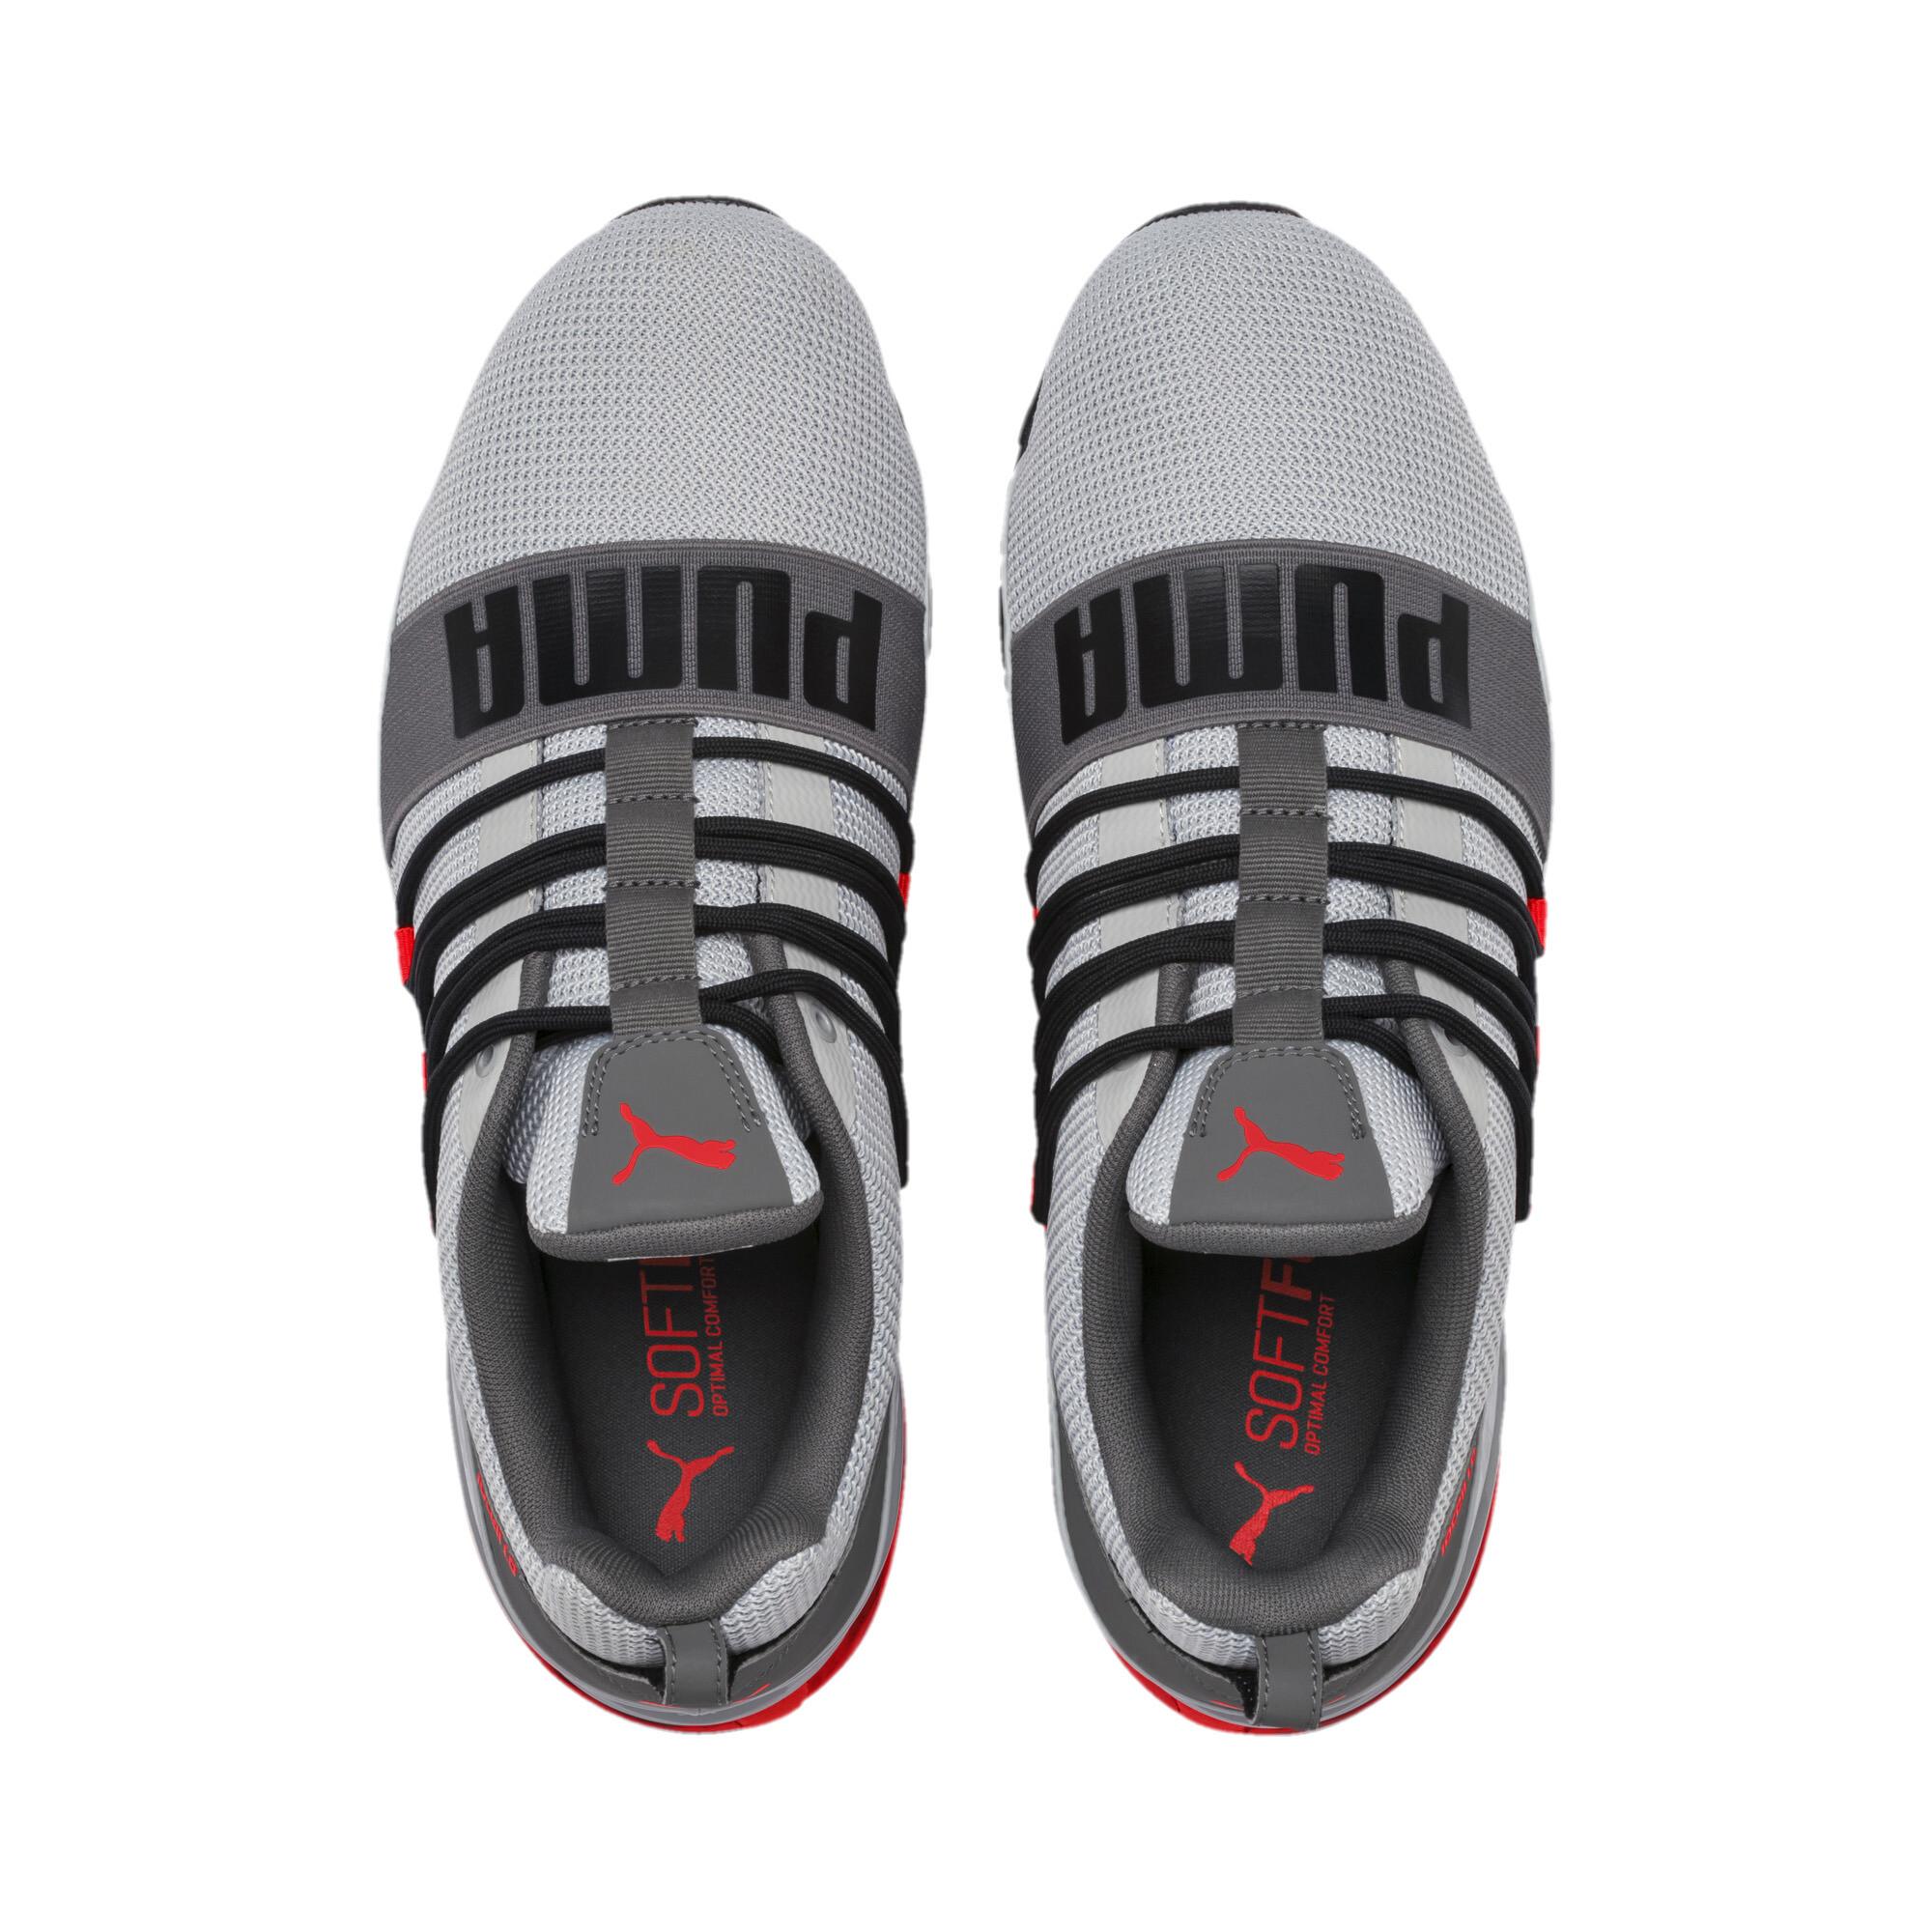 PUMA-CELL-Regulate-Camo-Men-s-Training-Shoes-Men-Shoe-Running thumbnail 8